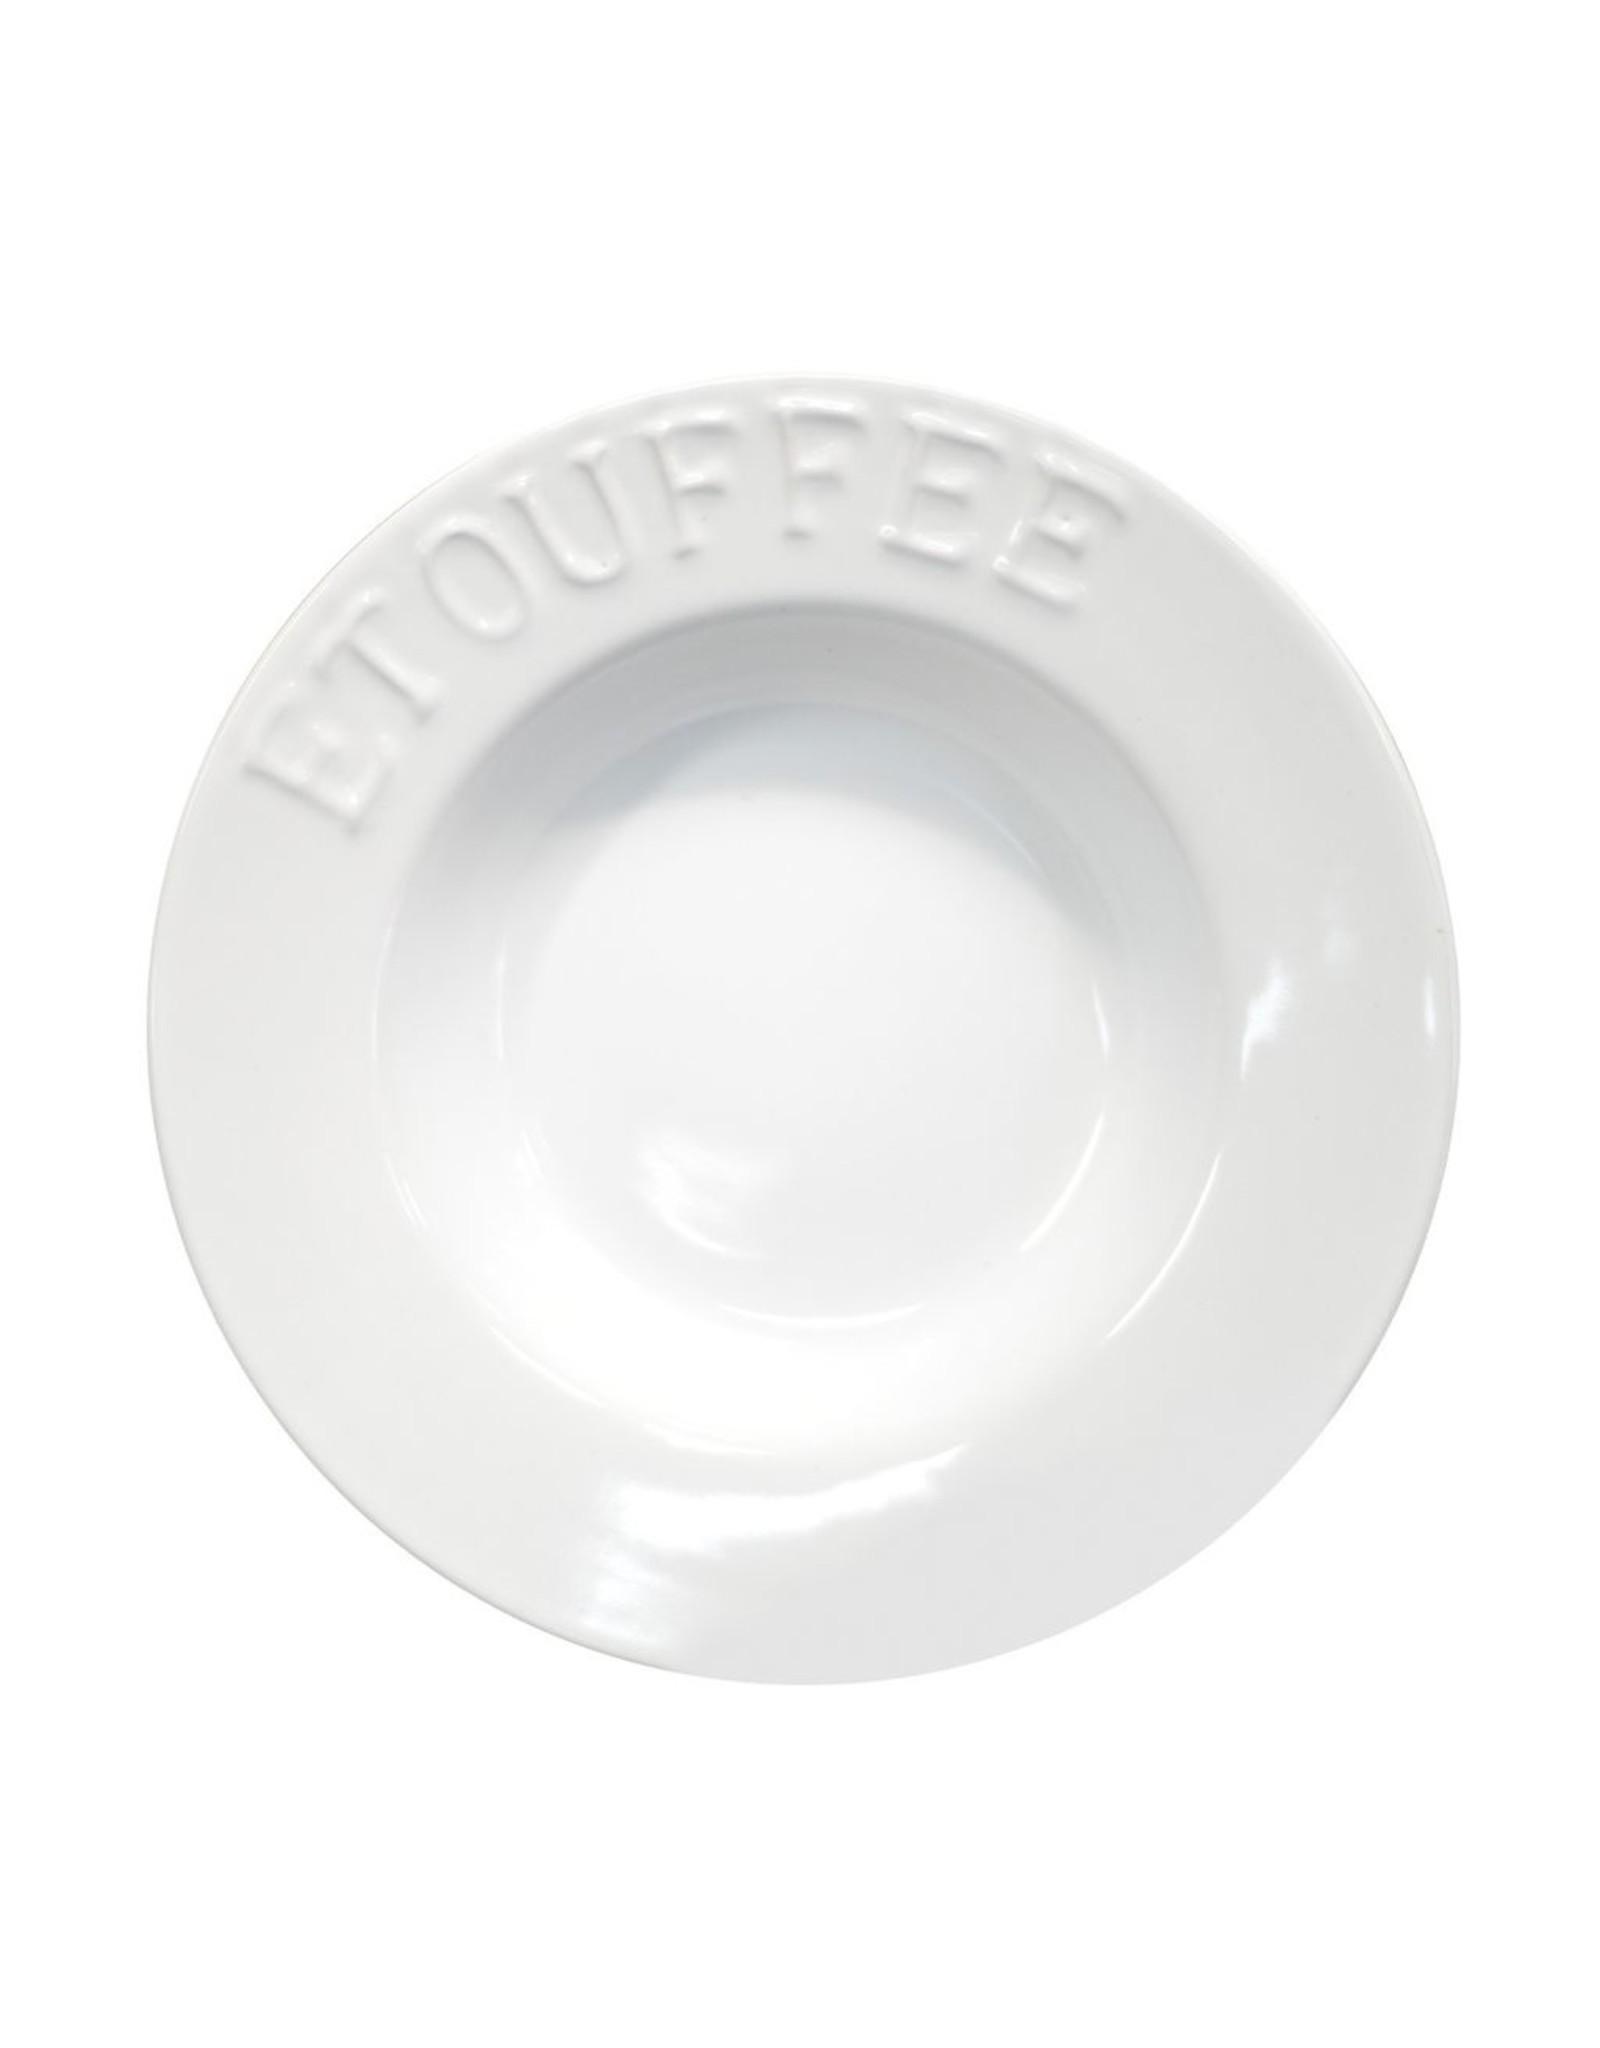 Roux Brand Etouffee Bowl